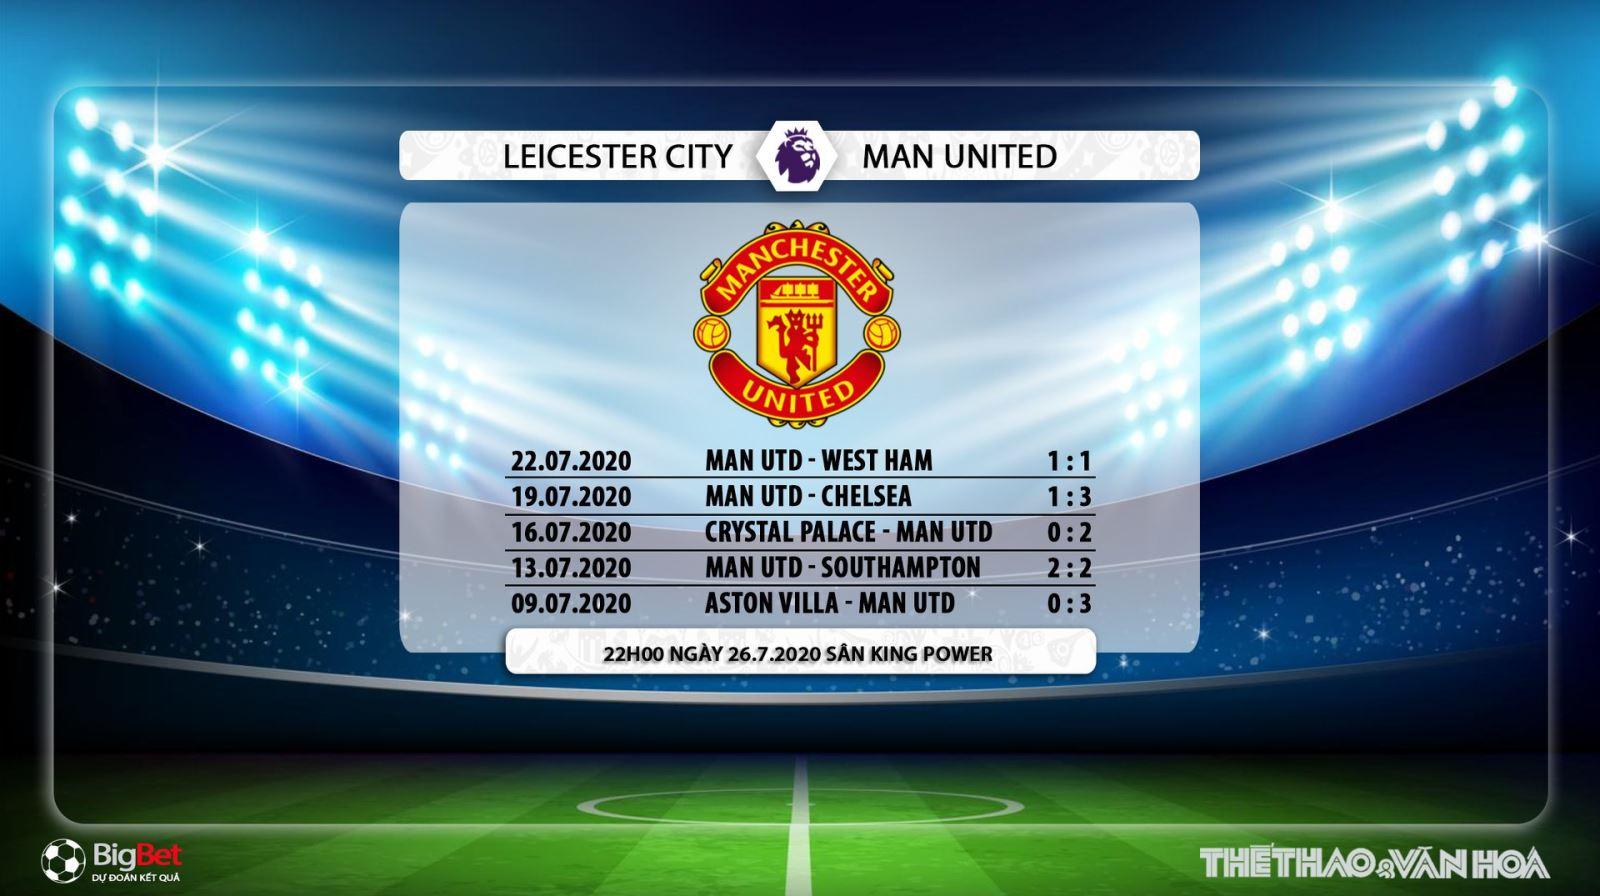 Leicester vs MU, Leicester đấu với MU, trực tiếp bóng đá, trực tiếp Leicester vs MU, soi kèo Leicester vs MU, soi kèo, kèo bóng đá, soi kèo bóng đá